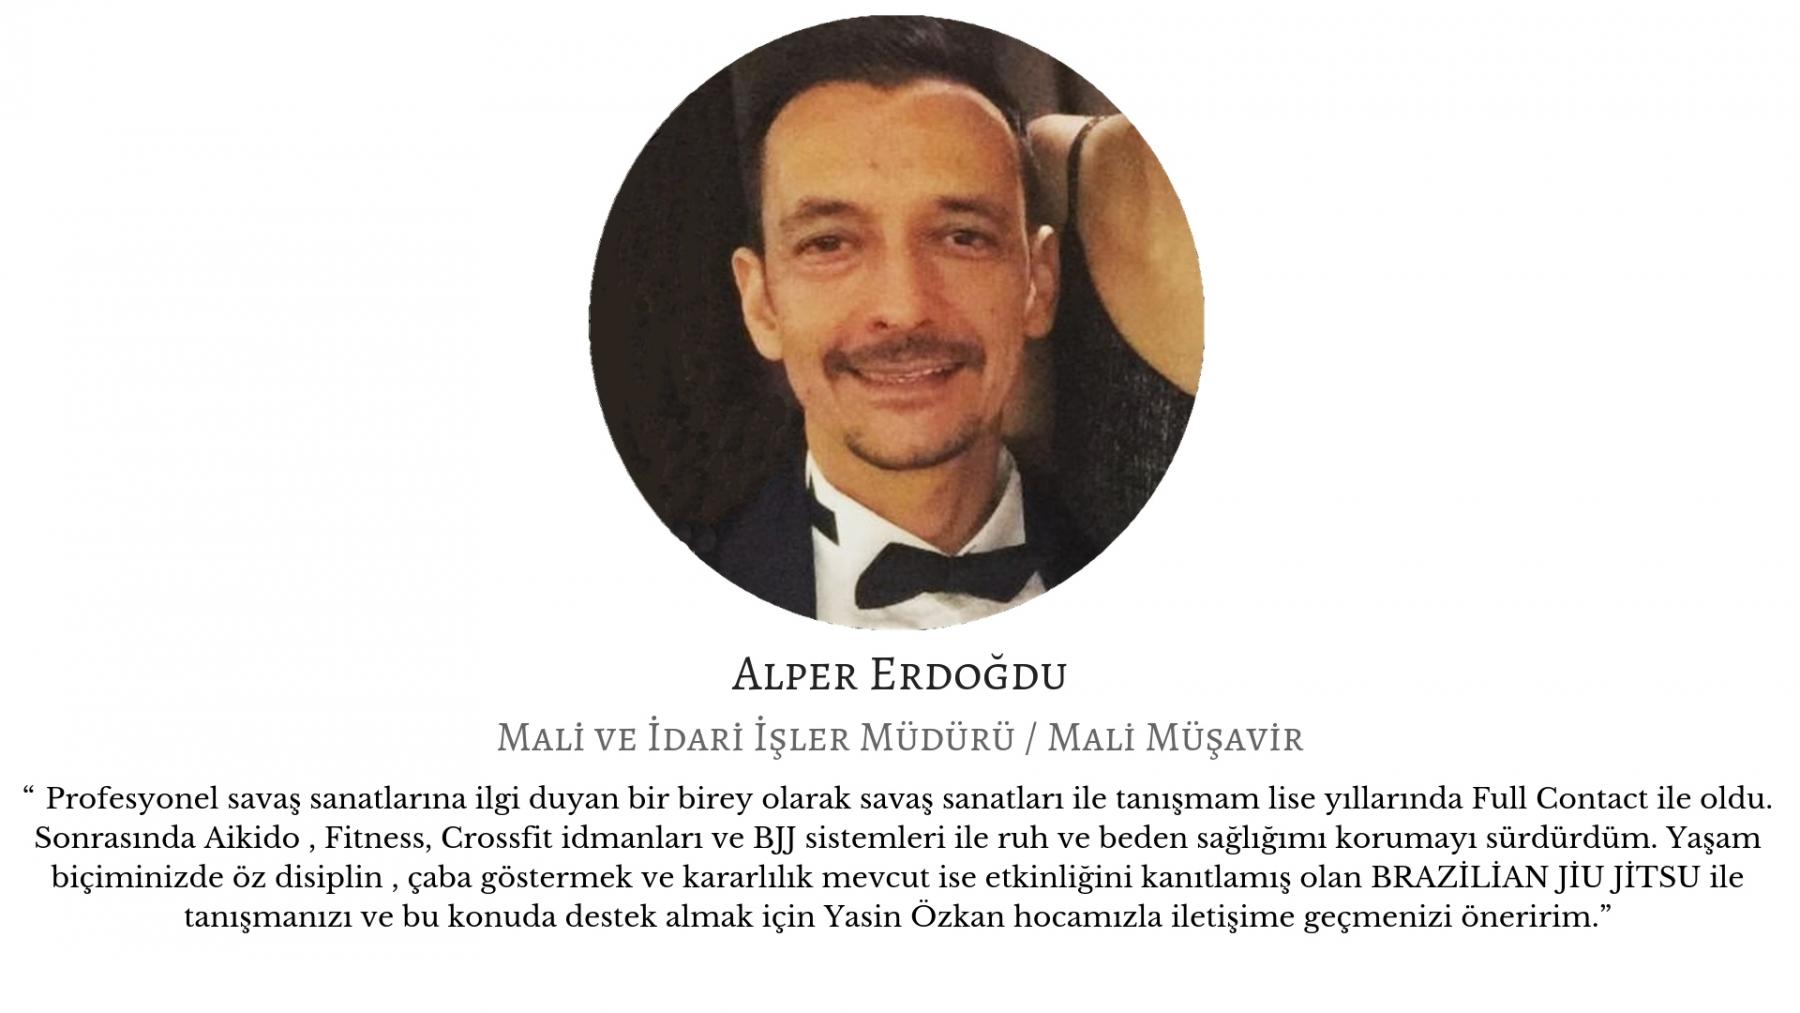 Alper Erdogdu yasin ozkan mma bjj izmir jiujitsu muay thai fitness pt